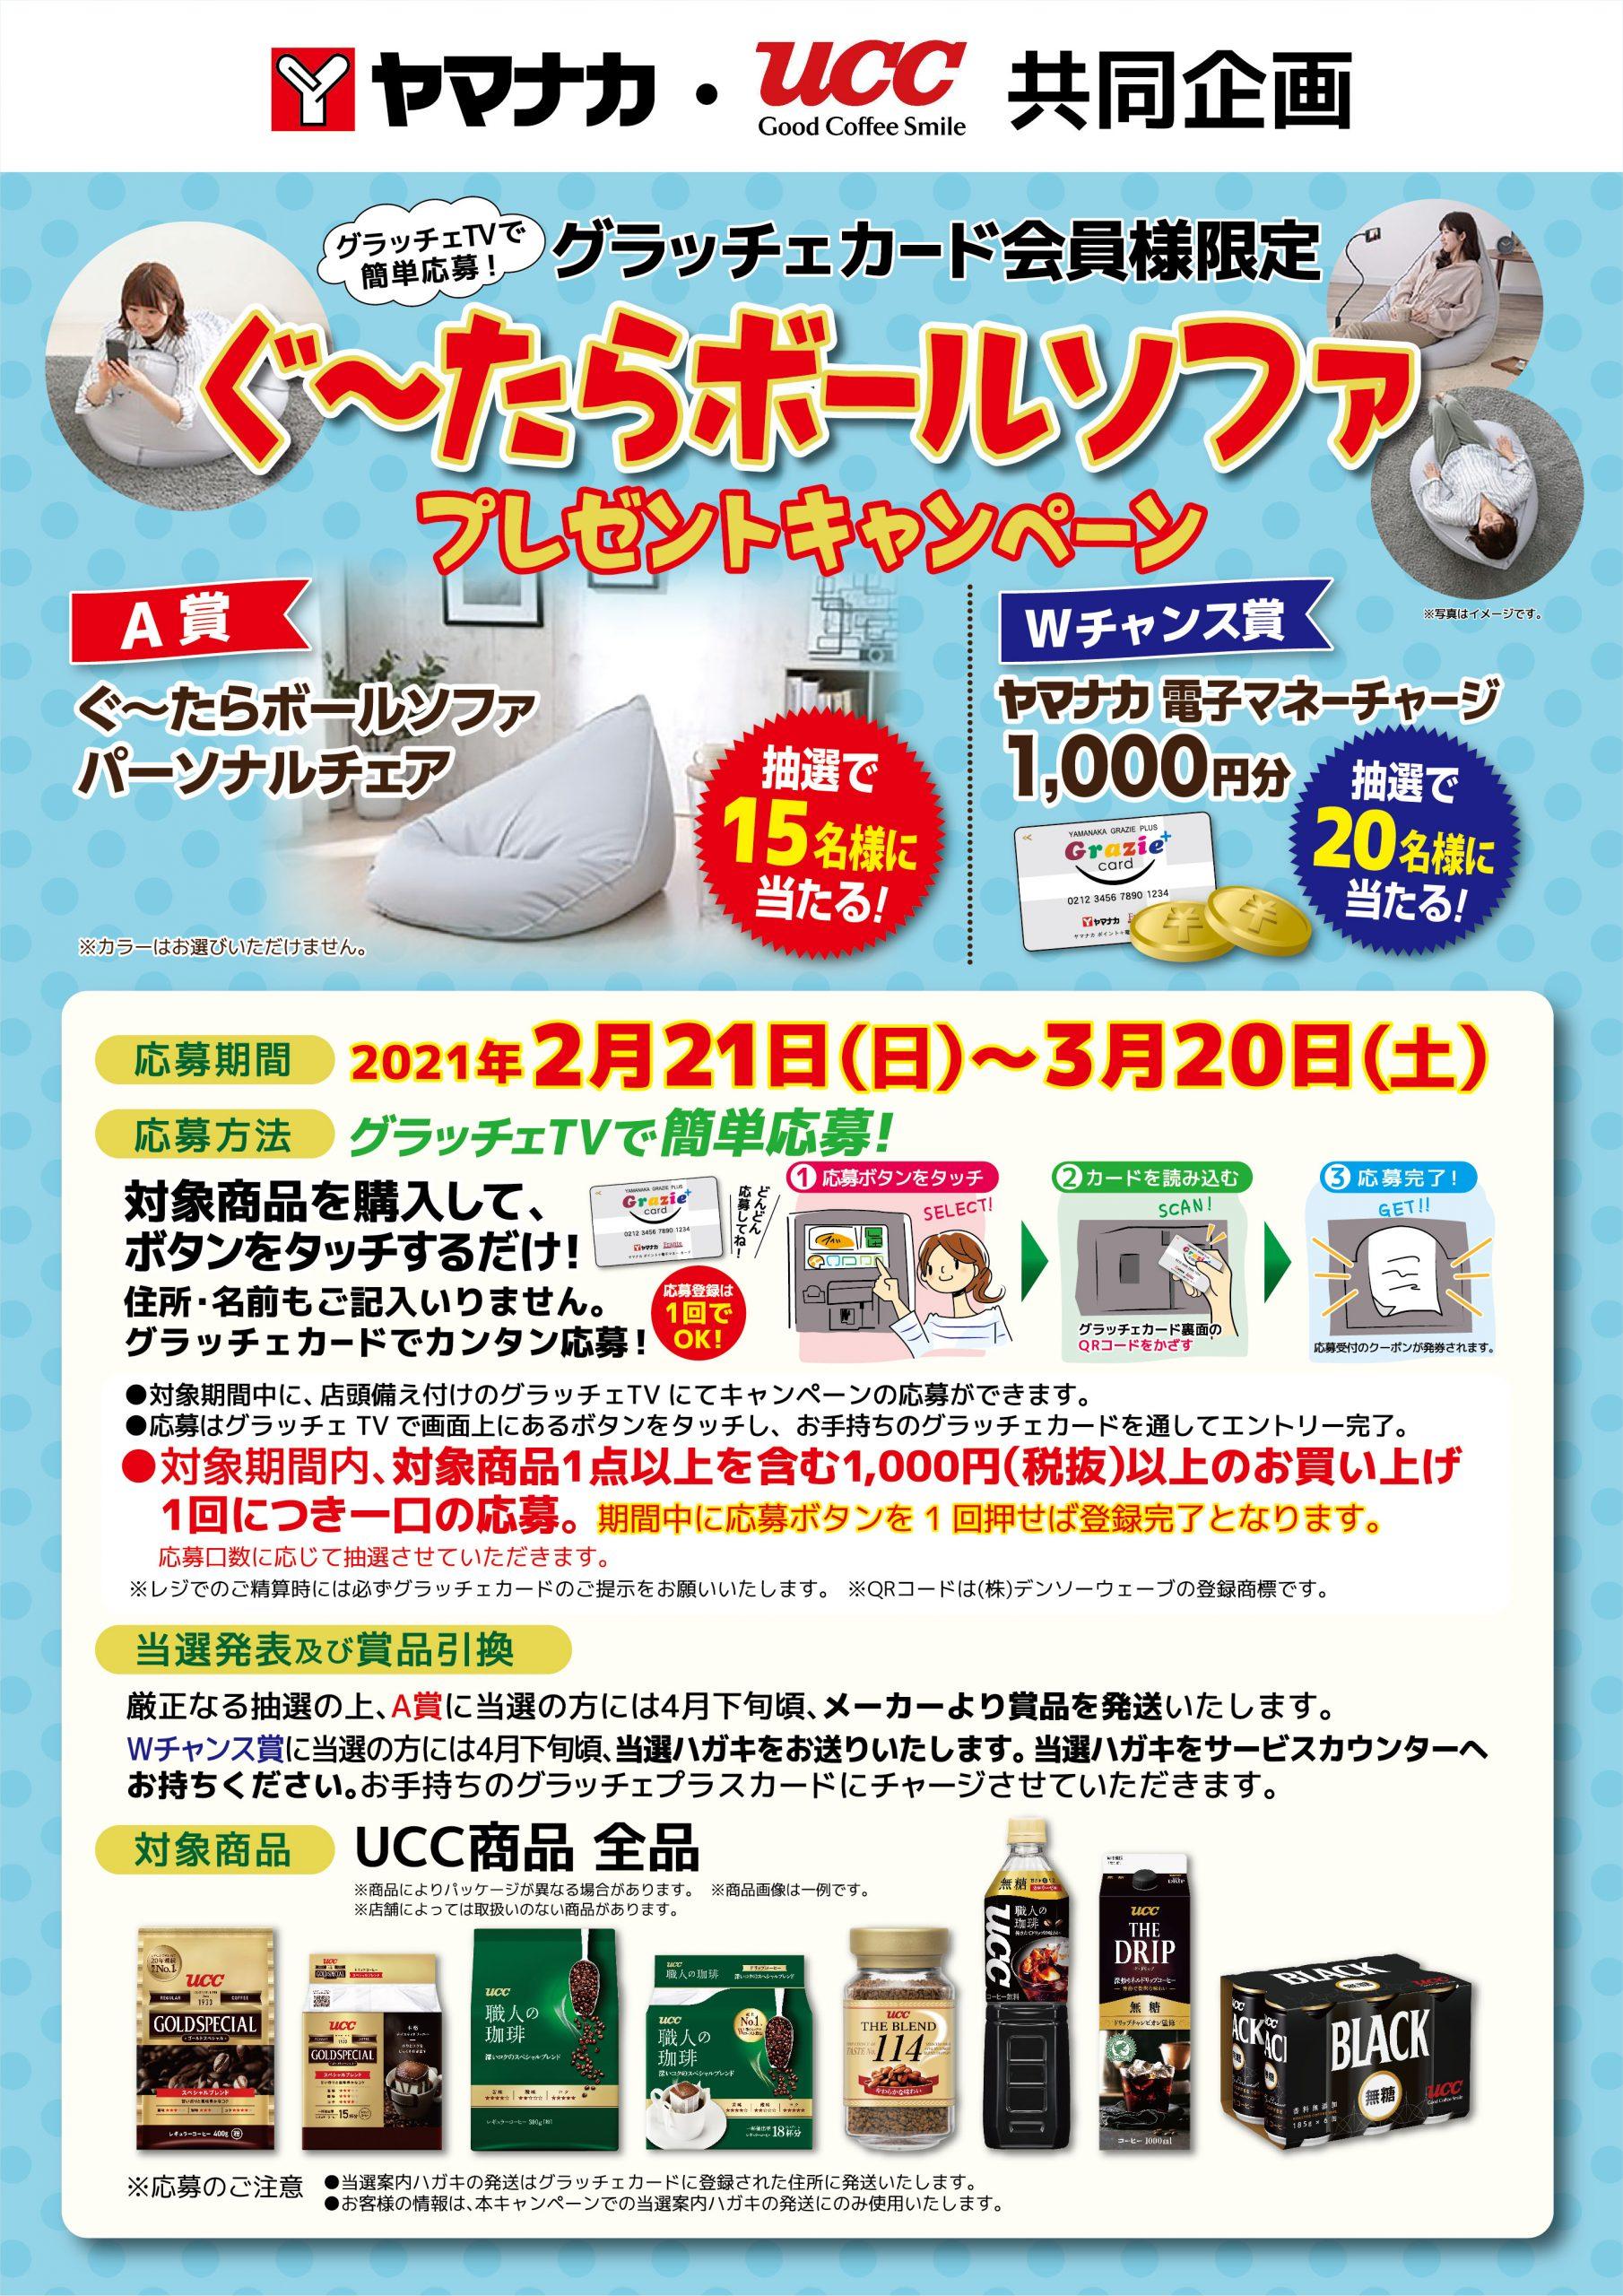 https://www.super-yamanaka.co.jp/wp/super/wp-content/uploads/2021/02/0221UCC-scaled.jpg